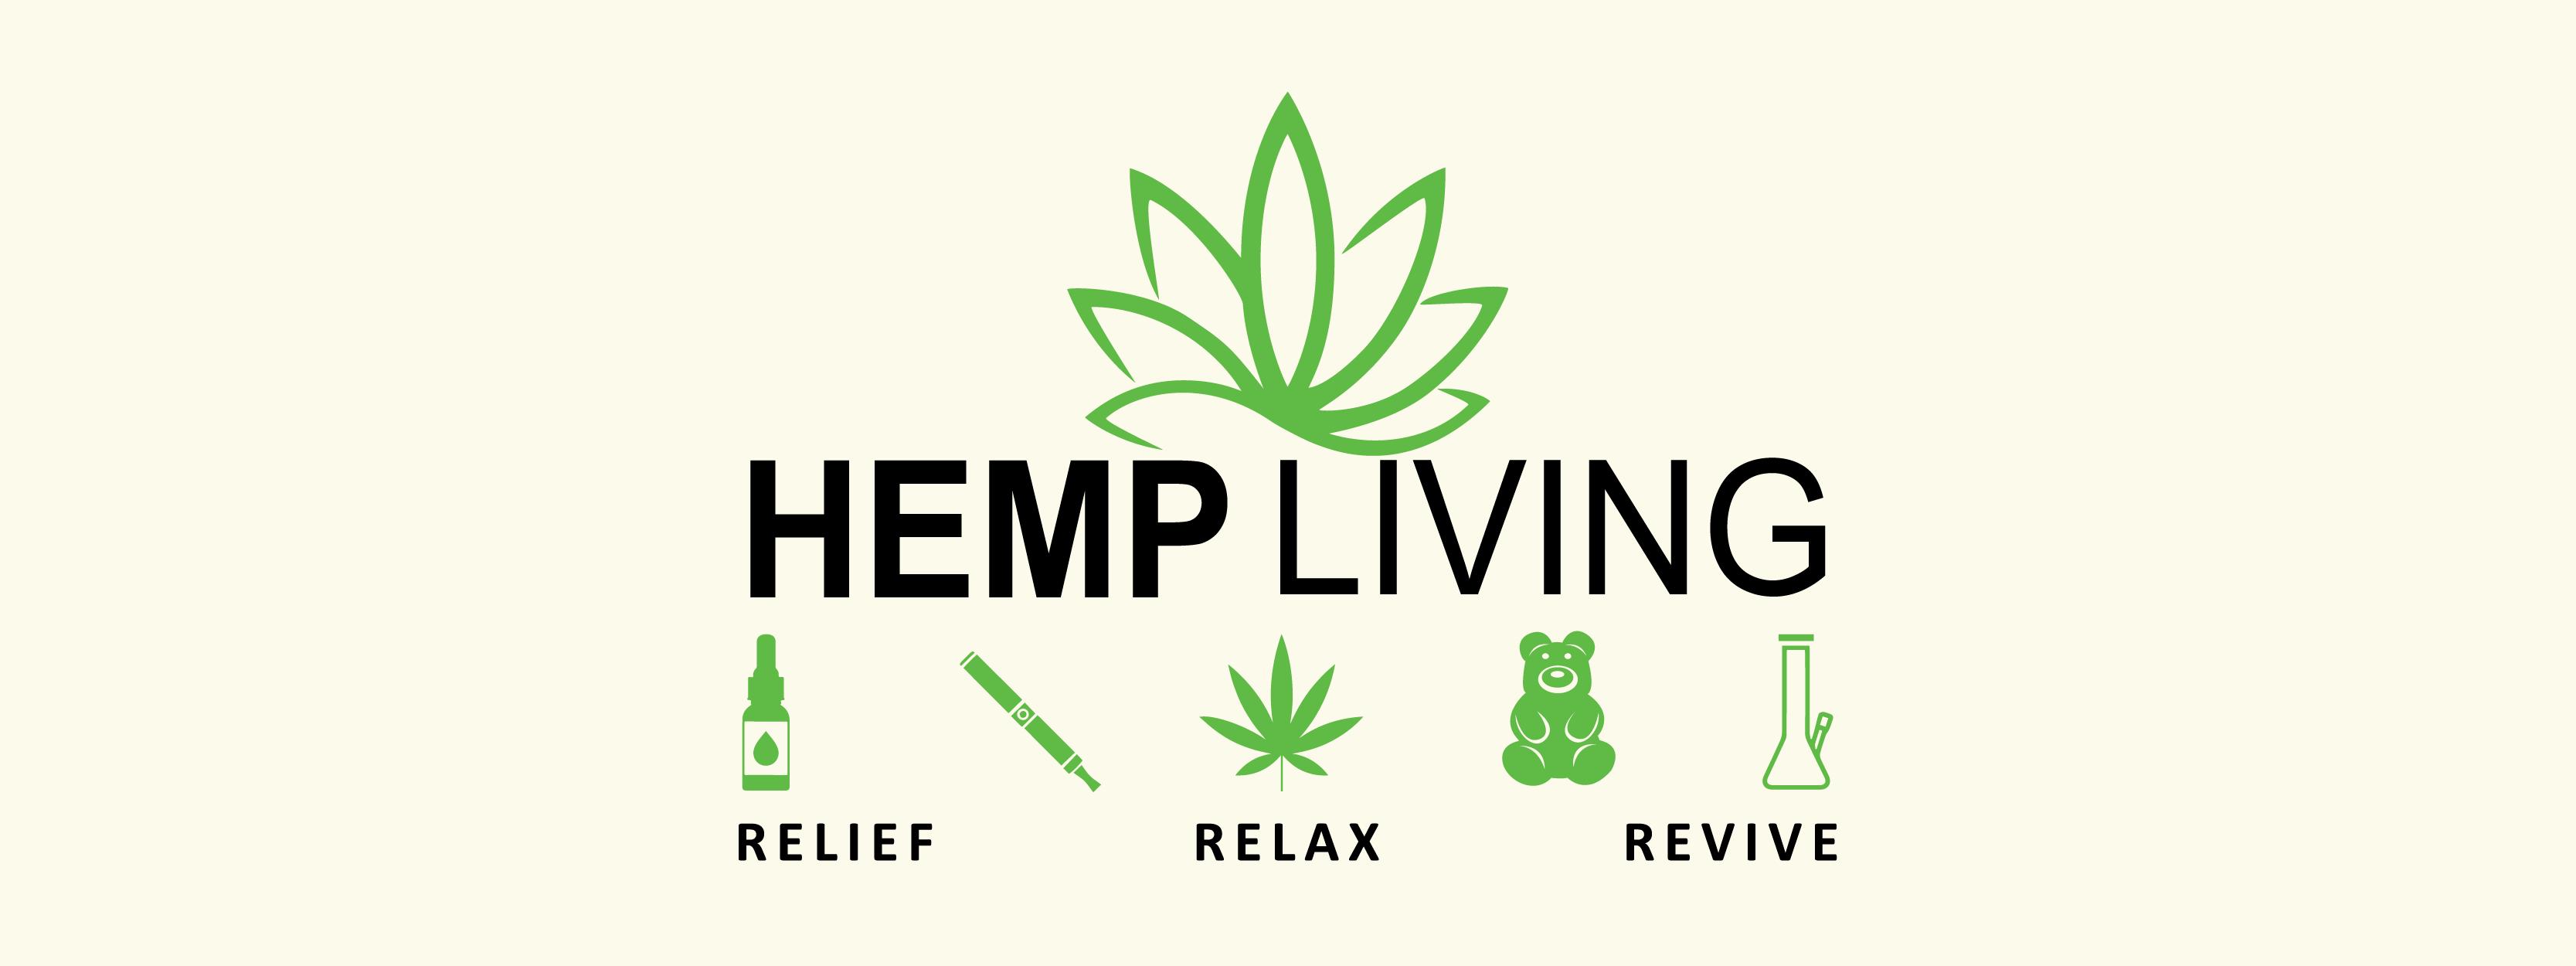 Hemp Living Wholesale featured image